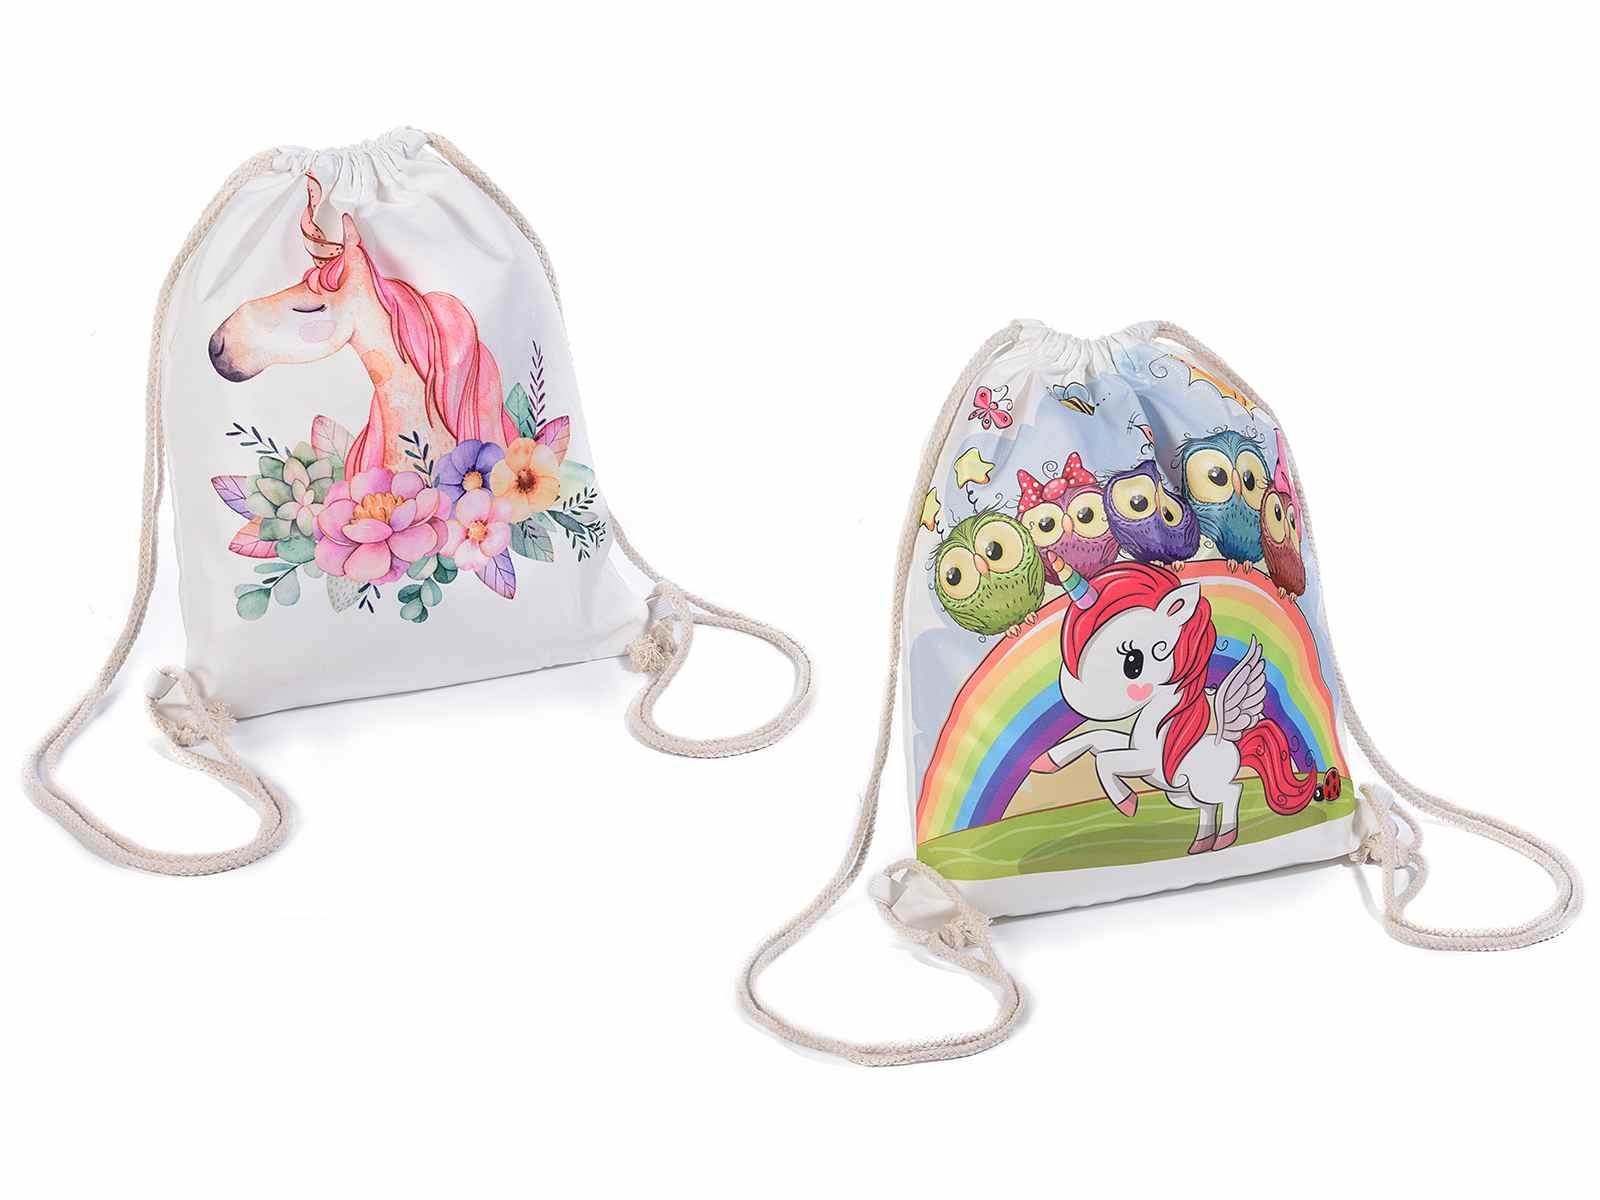 5466bc404 Mochila en forma de saco con motivo unicornio (16.04.72) - Art From ...